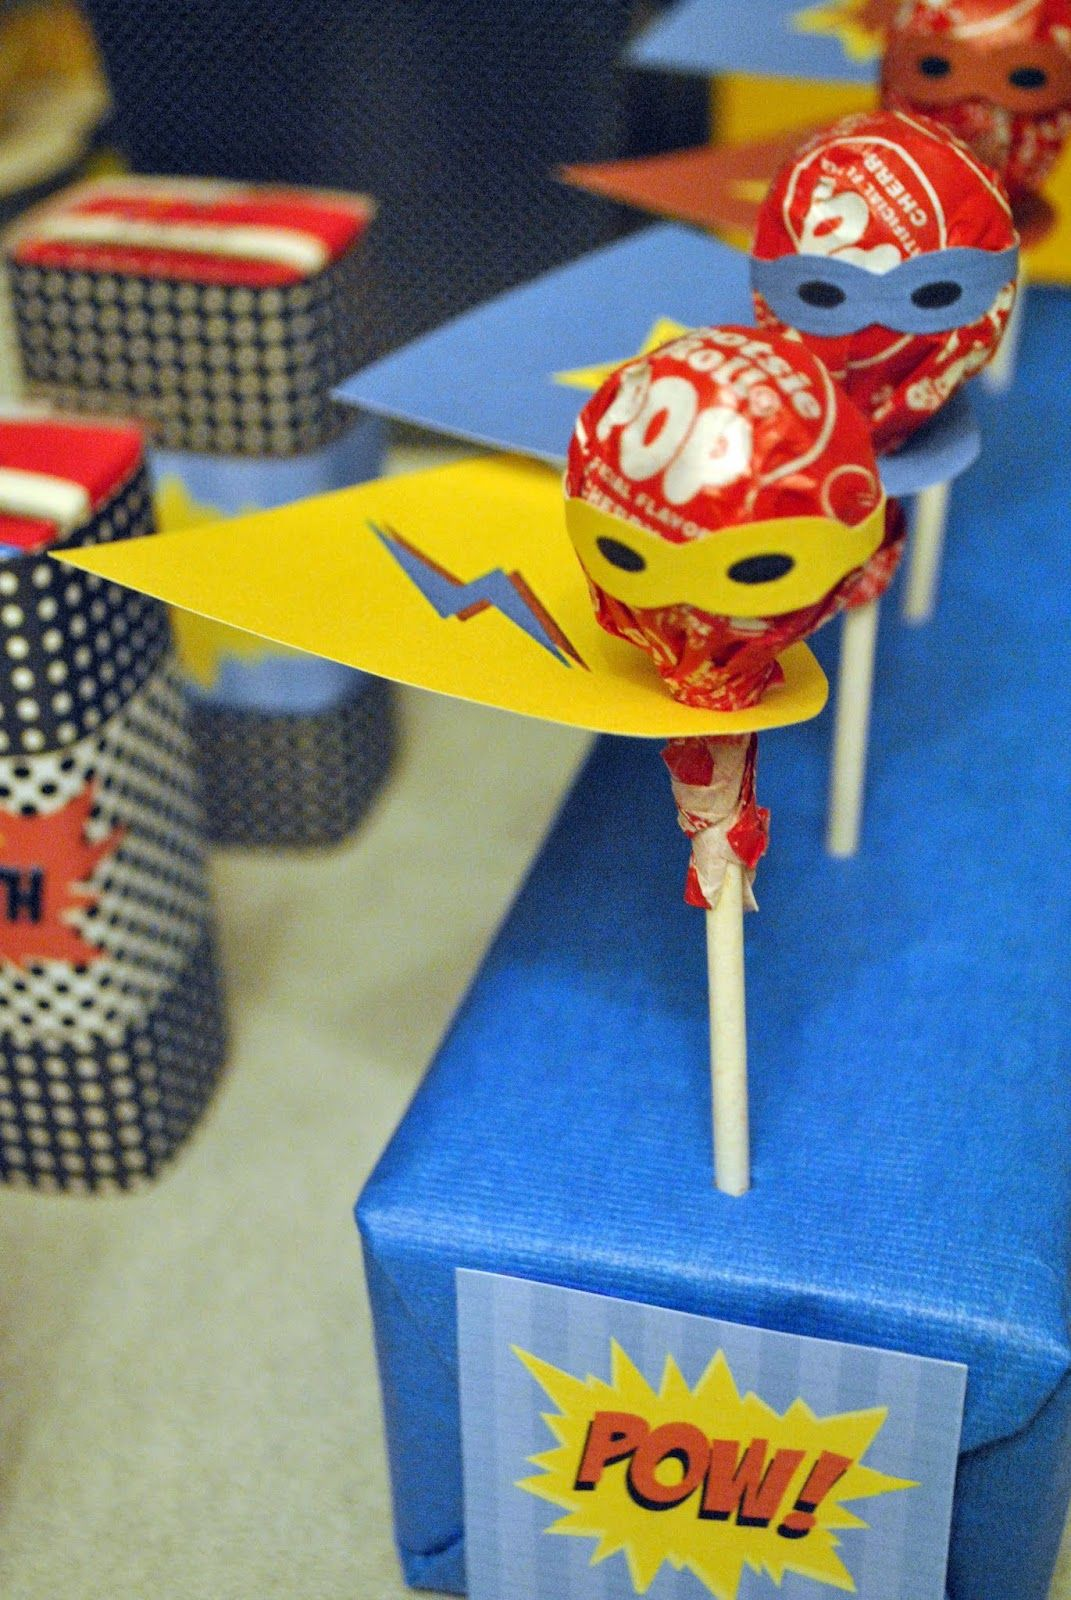 Superhero Treats For Kids Found These Cool Superhero Lollipop